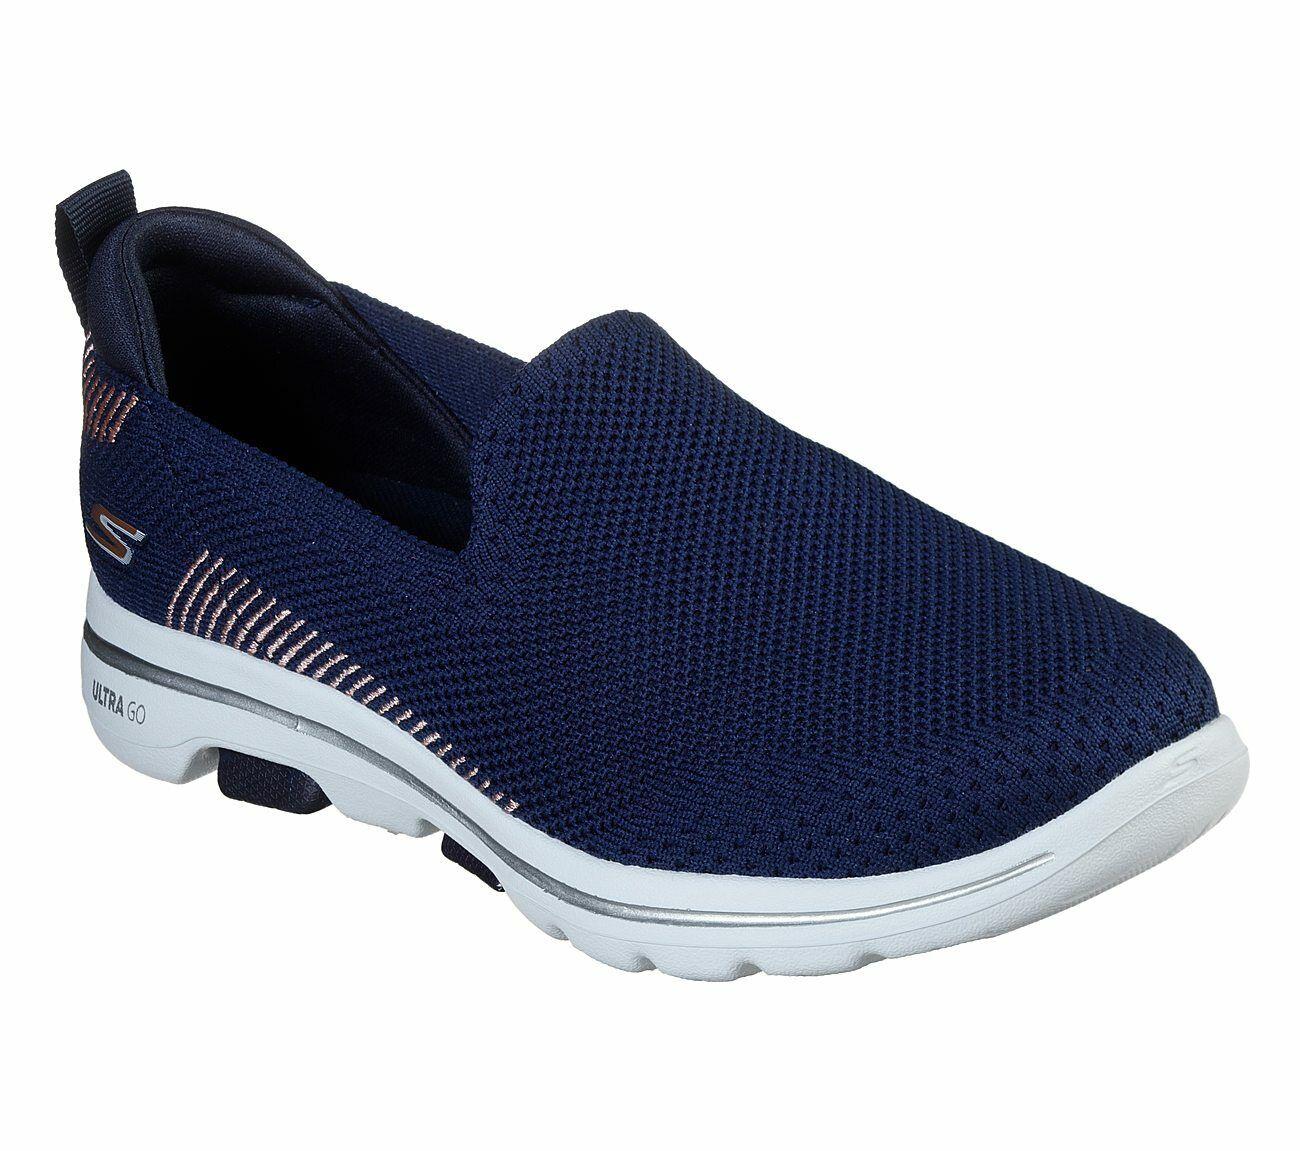 Skechers Shoes Navy Pink Go Walk 5 Women's Casual Slip On Comfort Sporty 15900